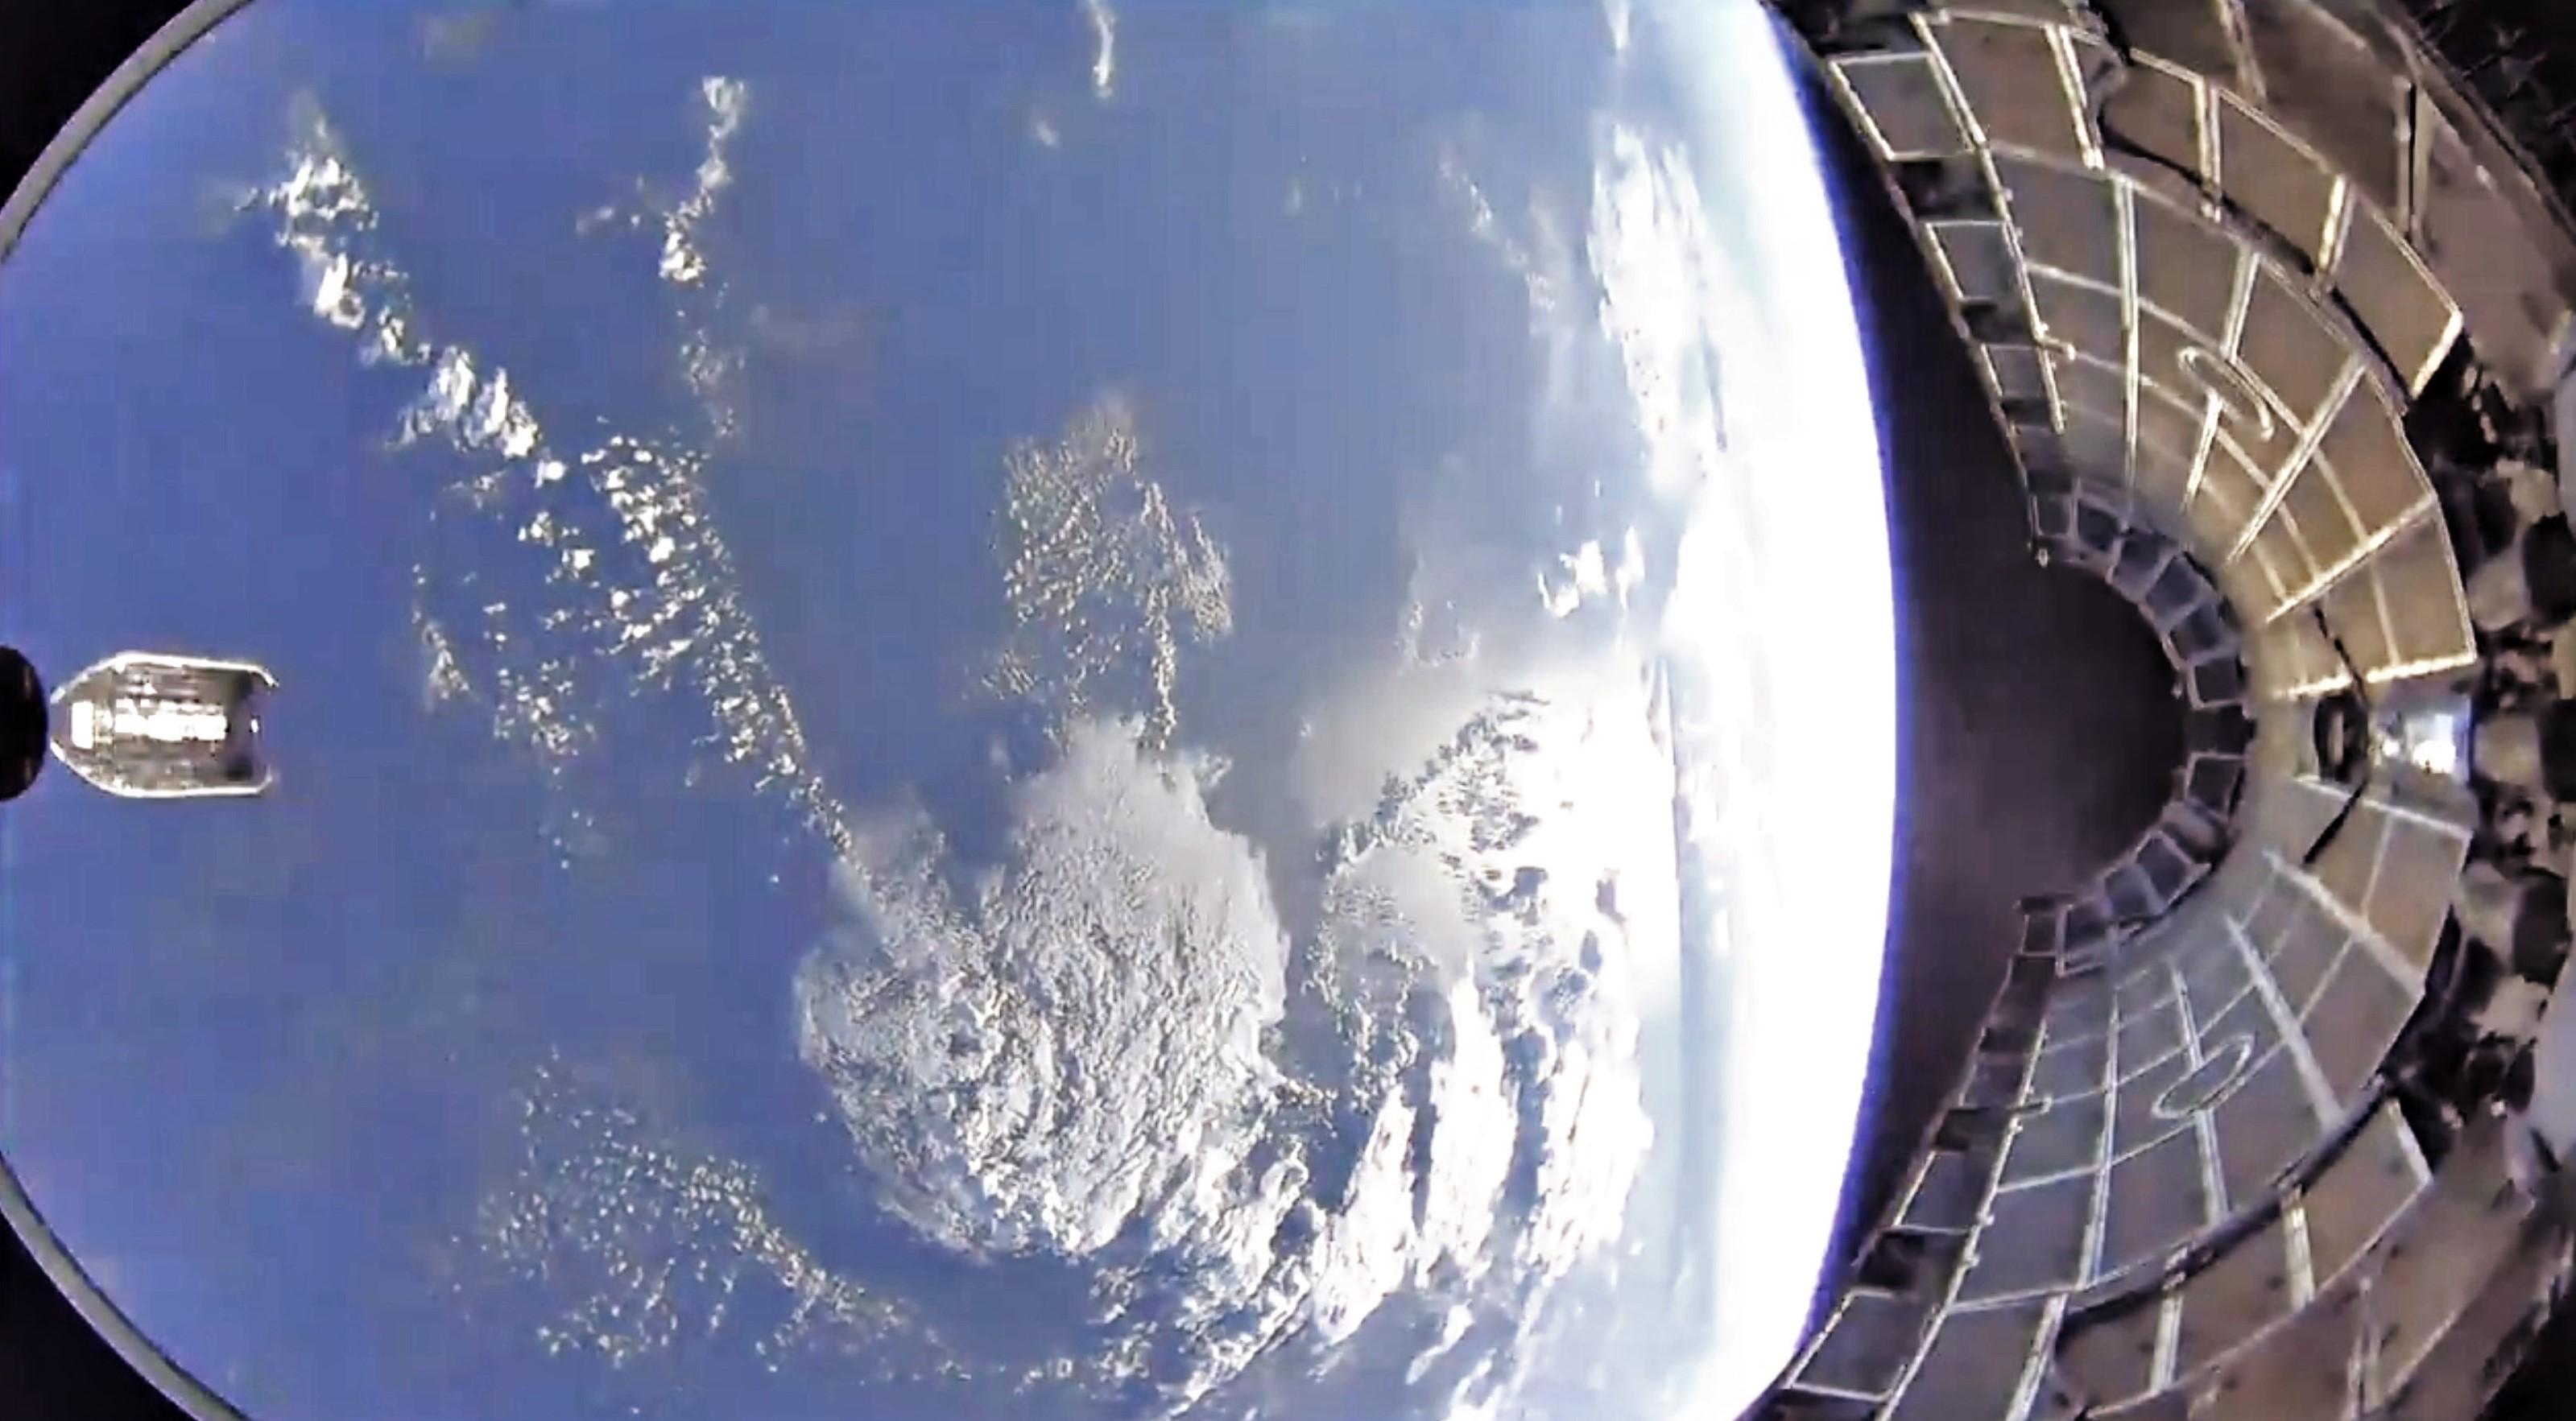 Arabsat 6A Falcon Heavy fairing jettison April 2019 (SpaceX) 1 edit